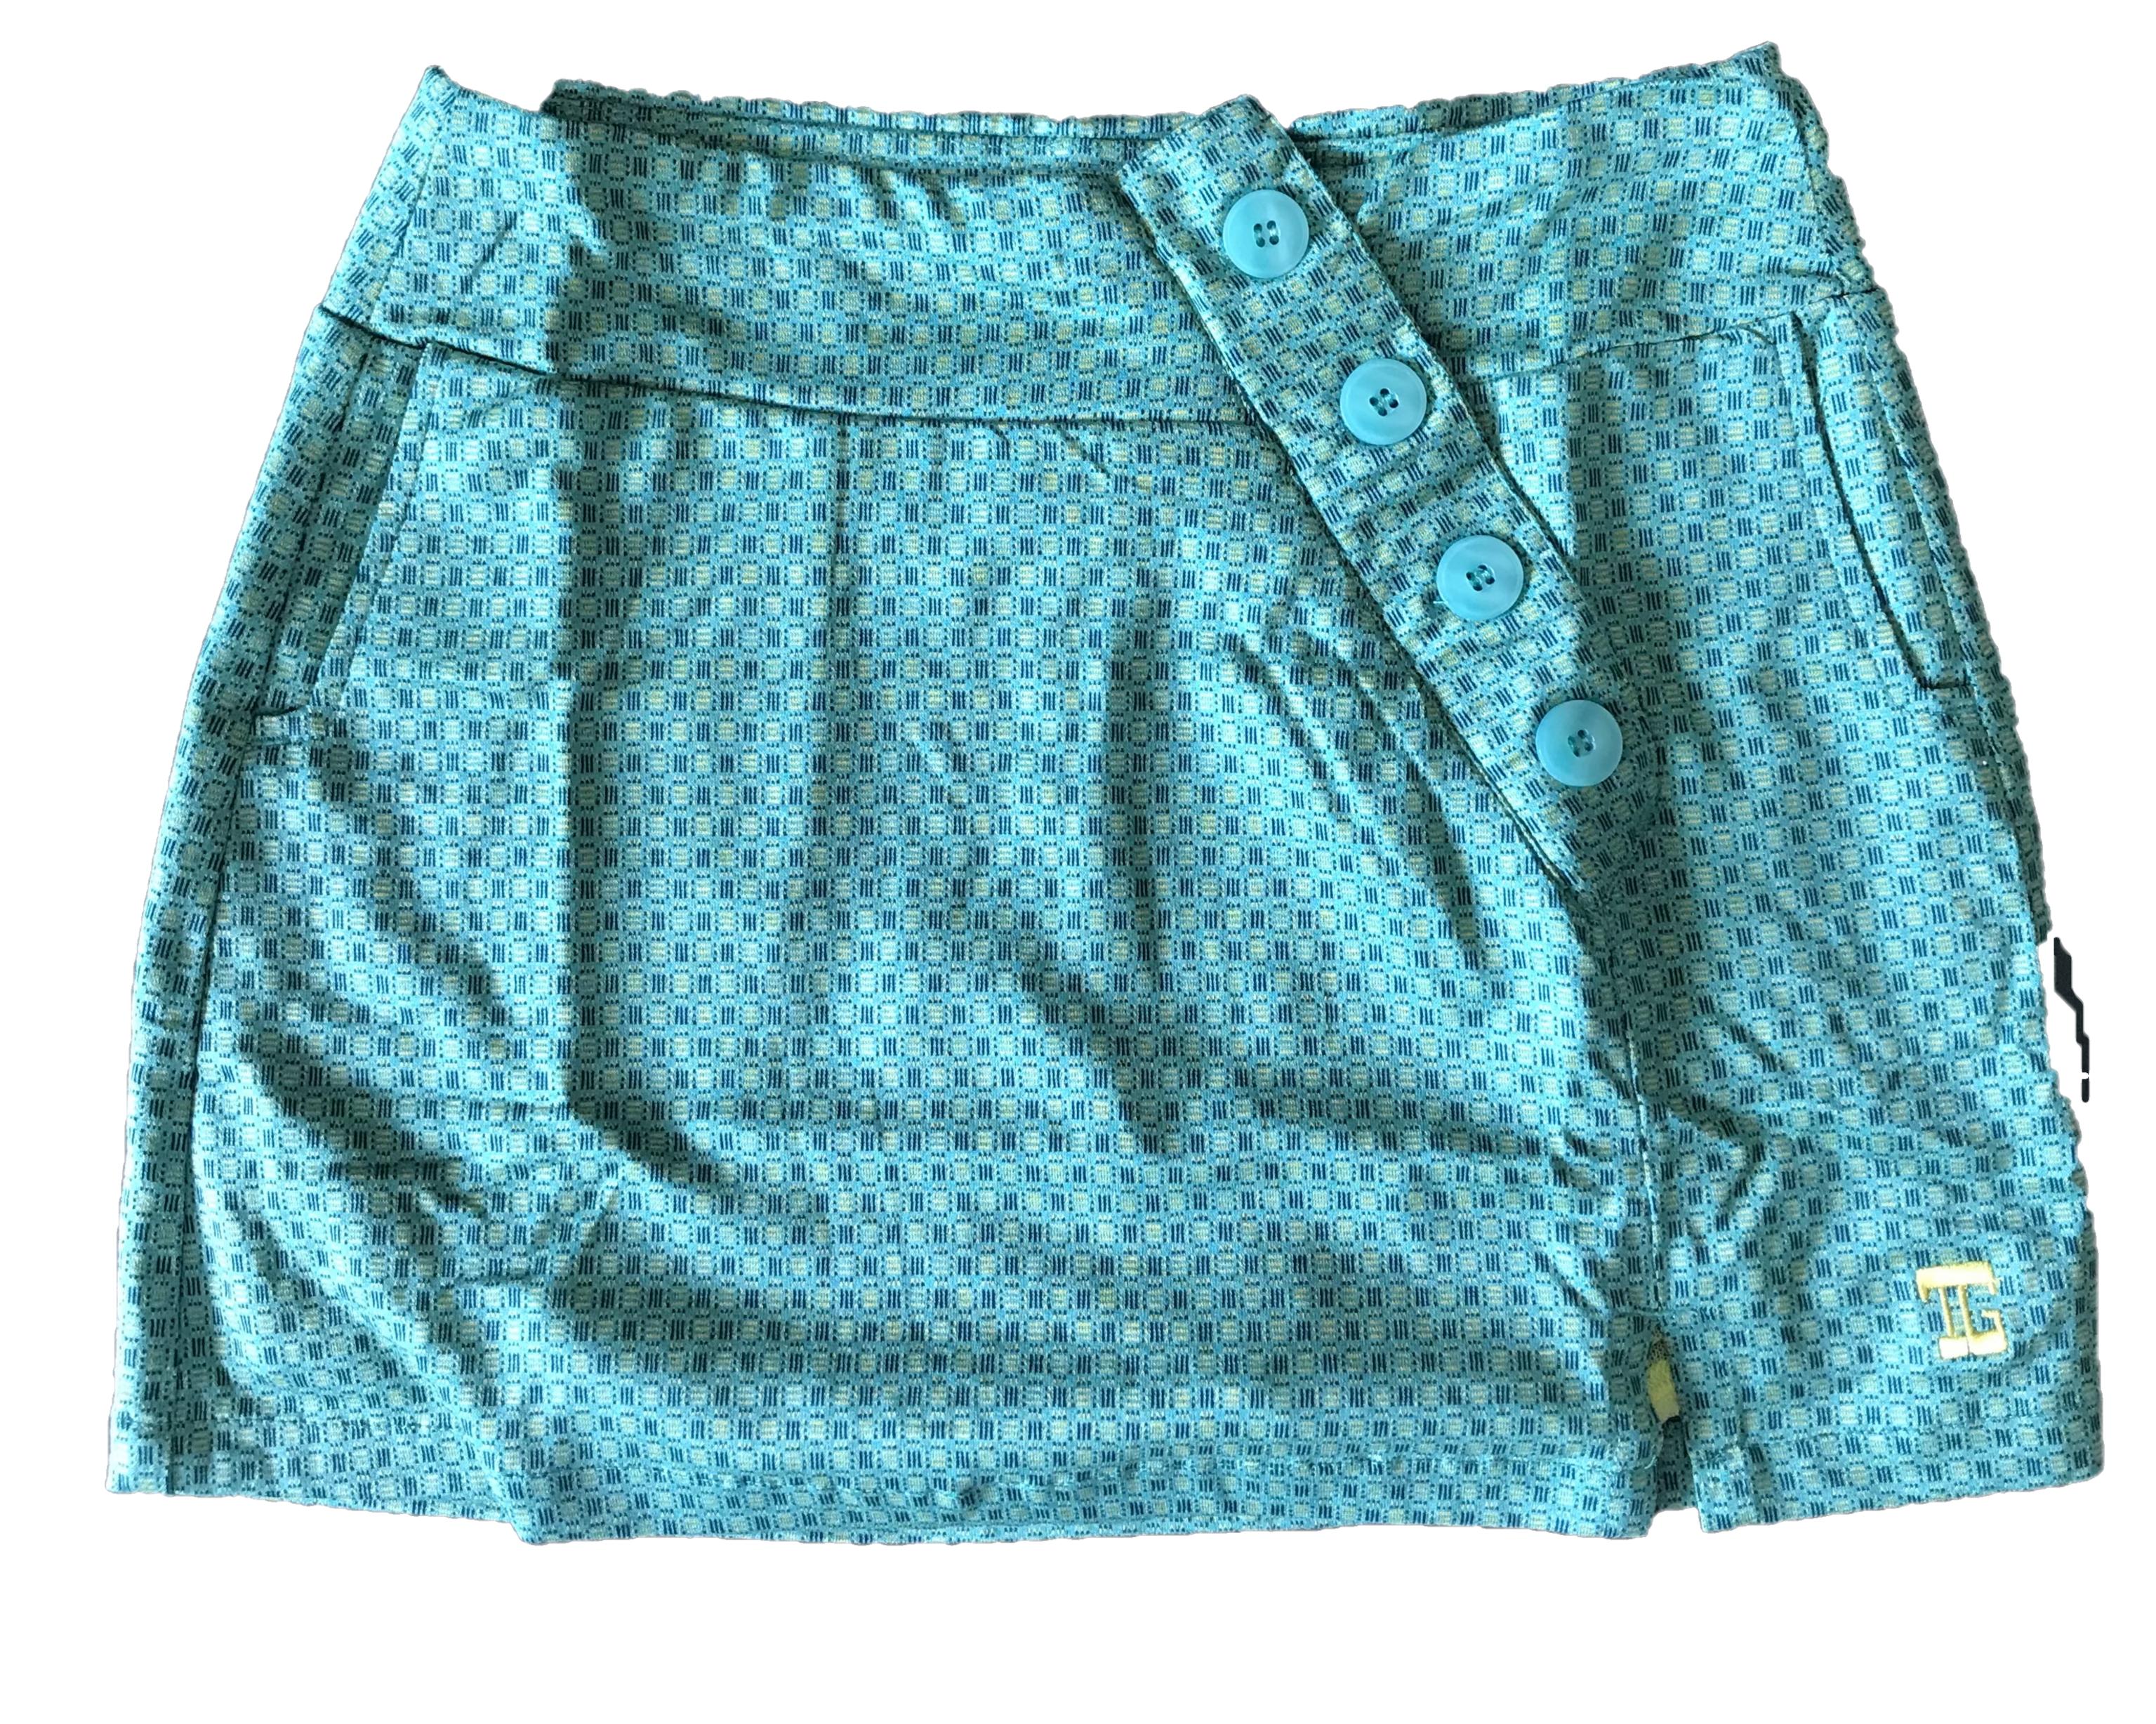 LS-059H    Skirt Dark Green With 3 White Horizontal And 3 Dark Blue Vertical Short Line Motif.  4 Decorative Buttons Conceal The Skirt Zipper